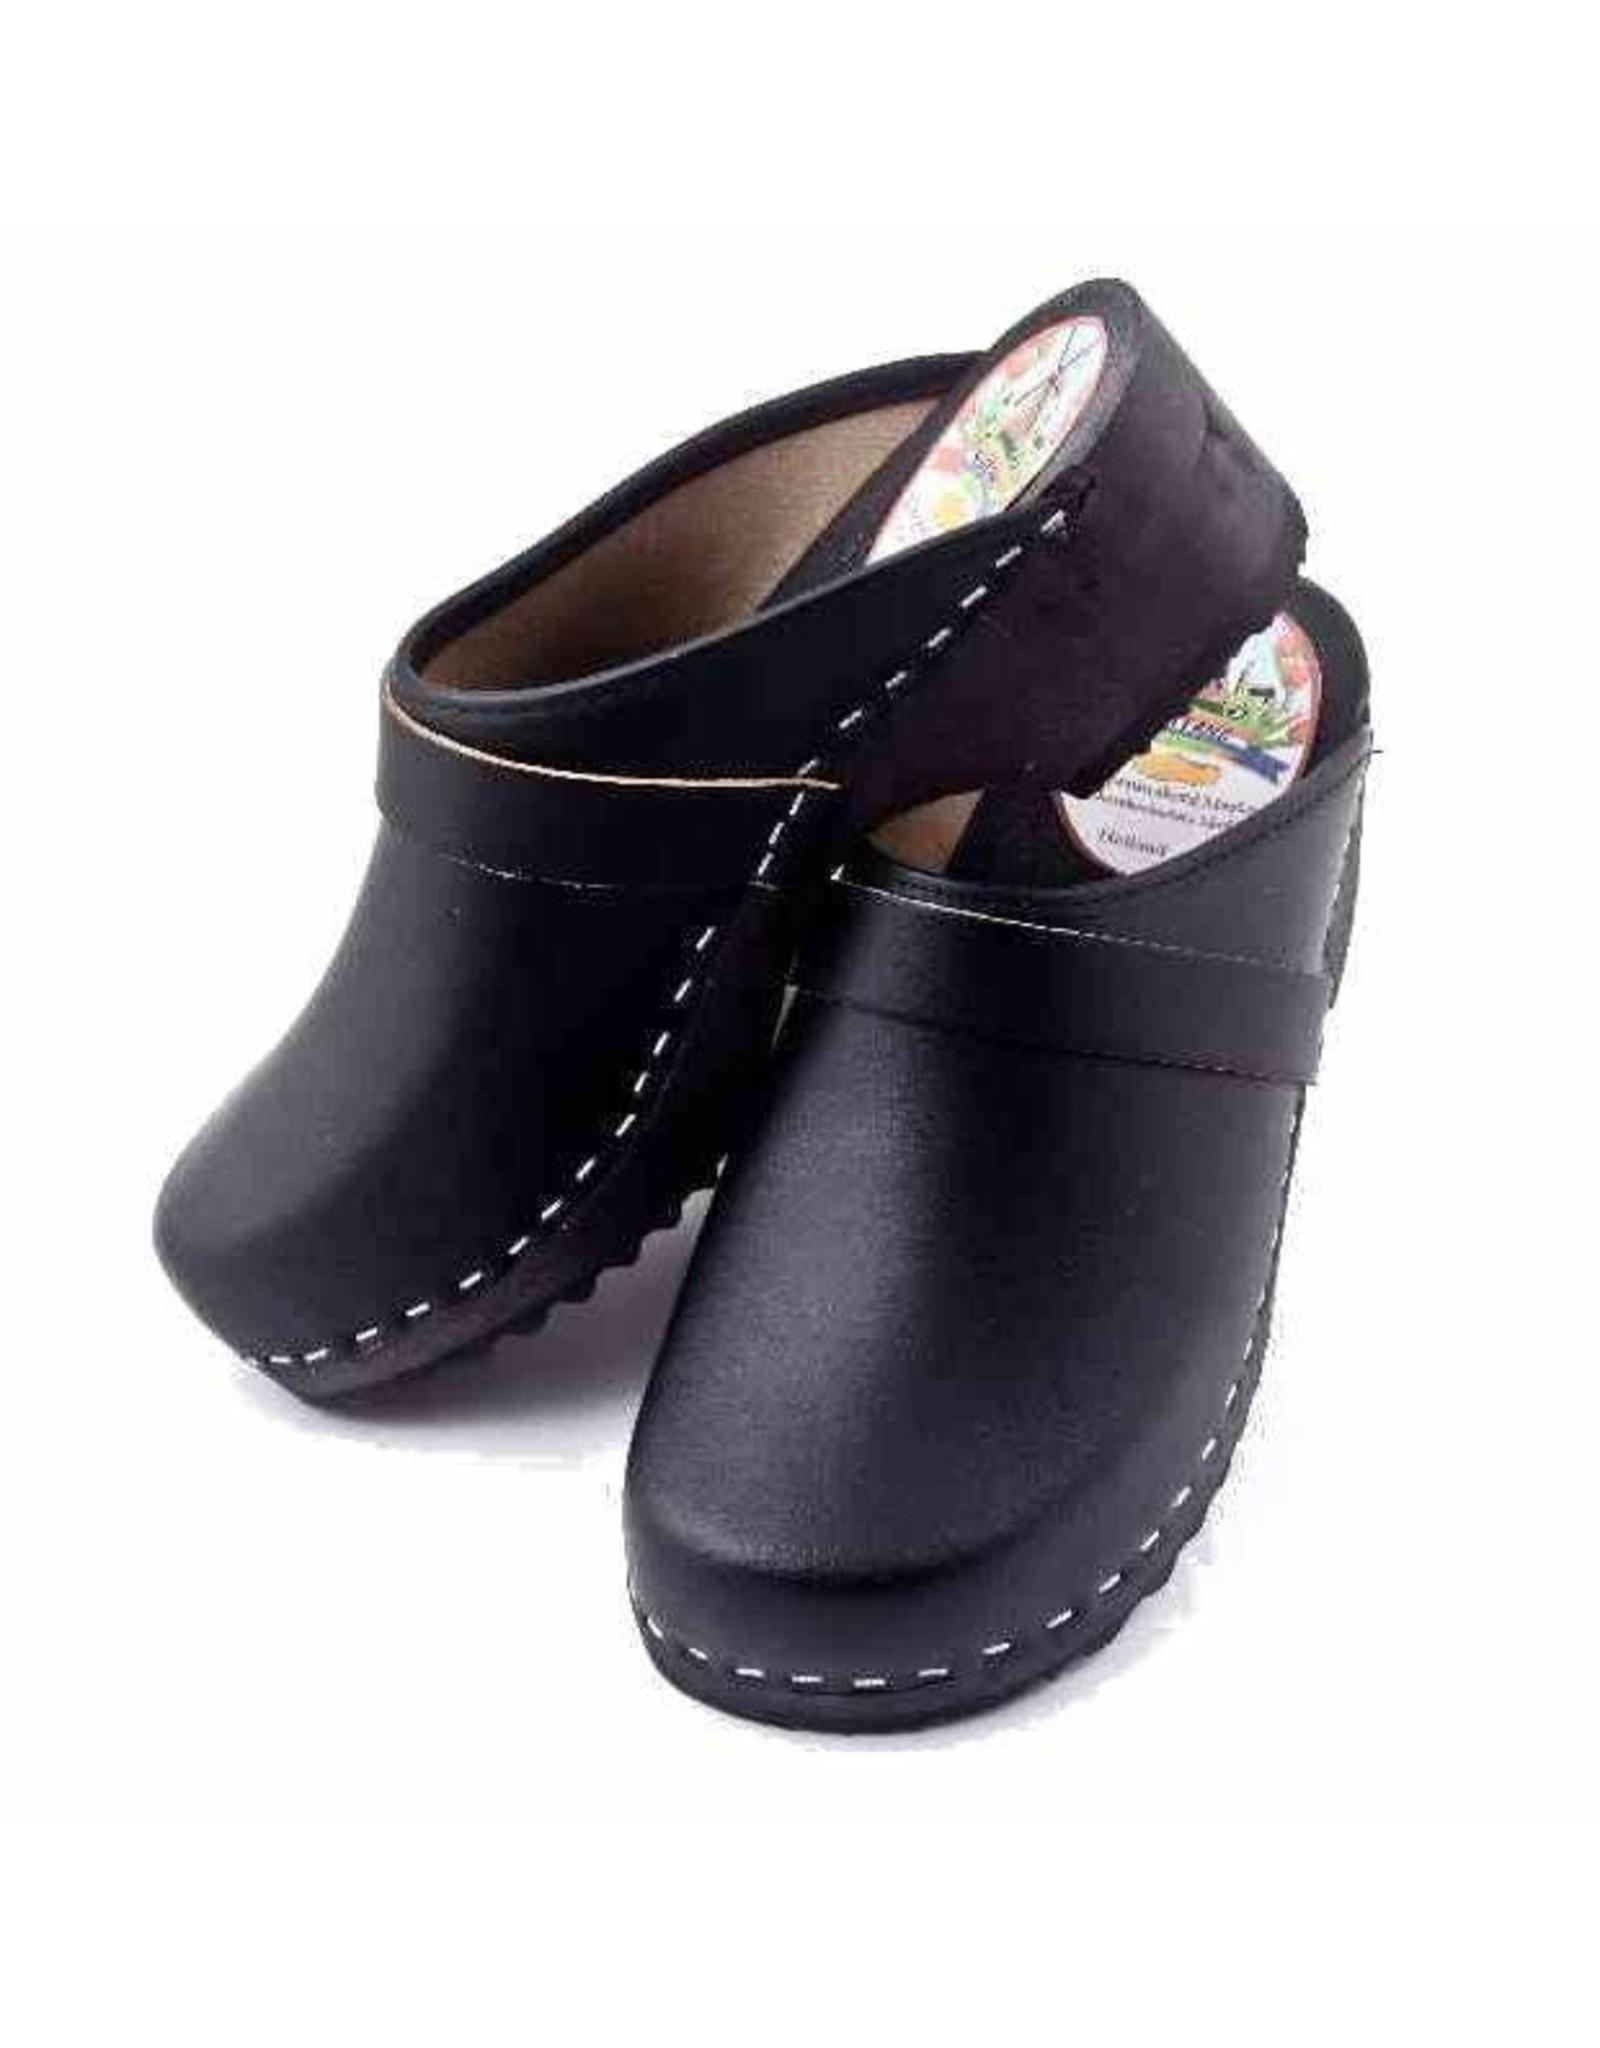 Simson Leather Clogs, Simson, Brown